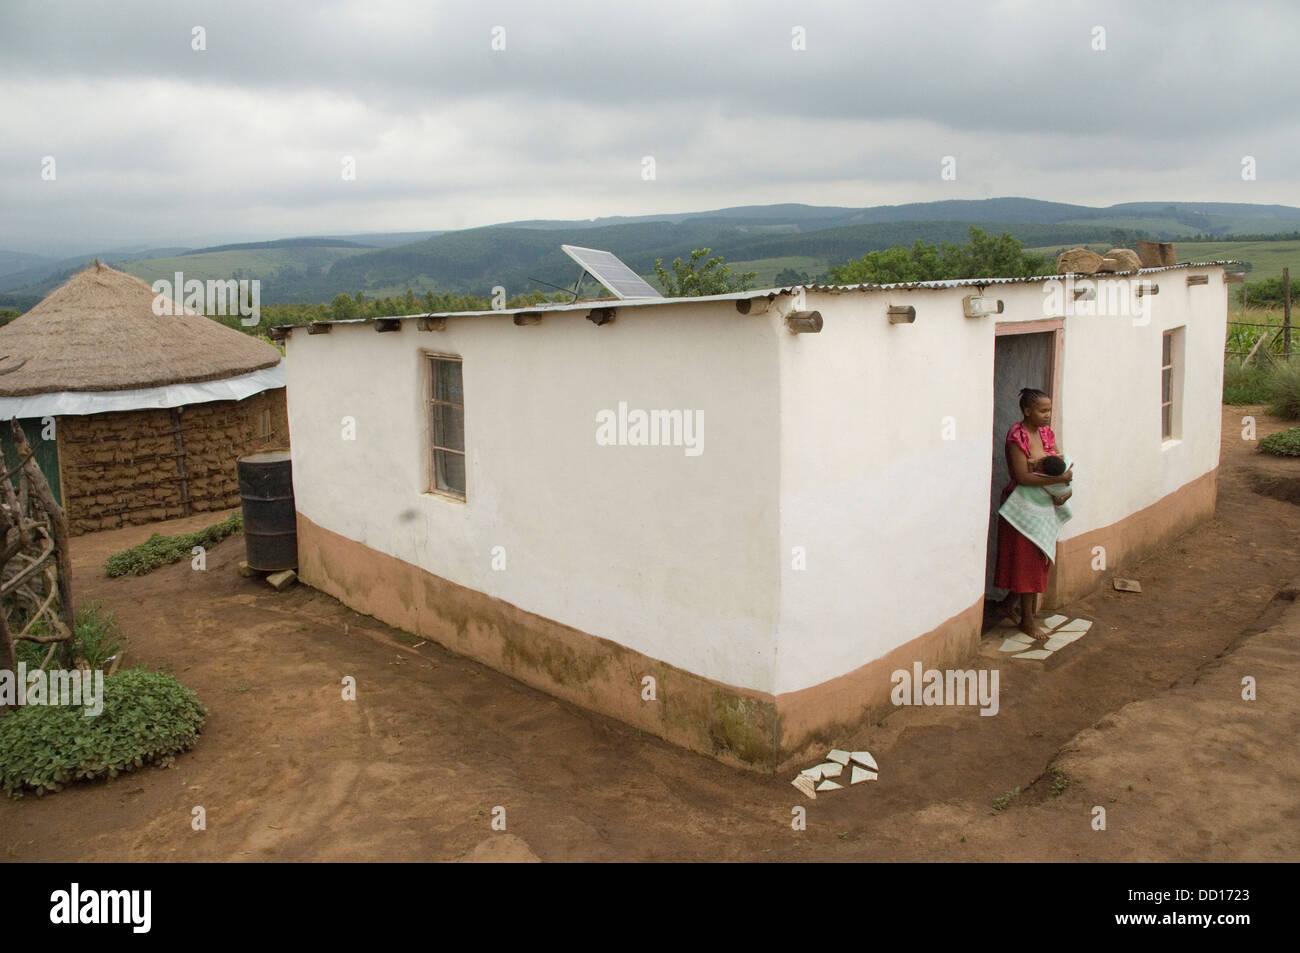 Farbe Bilder Digitall Projekt Alphabetisierung (2007) Februar 2007 Kwazulu Natal MR0051/07 Kwahlongwa Gemeinschaft Stockbild